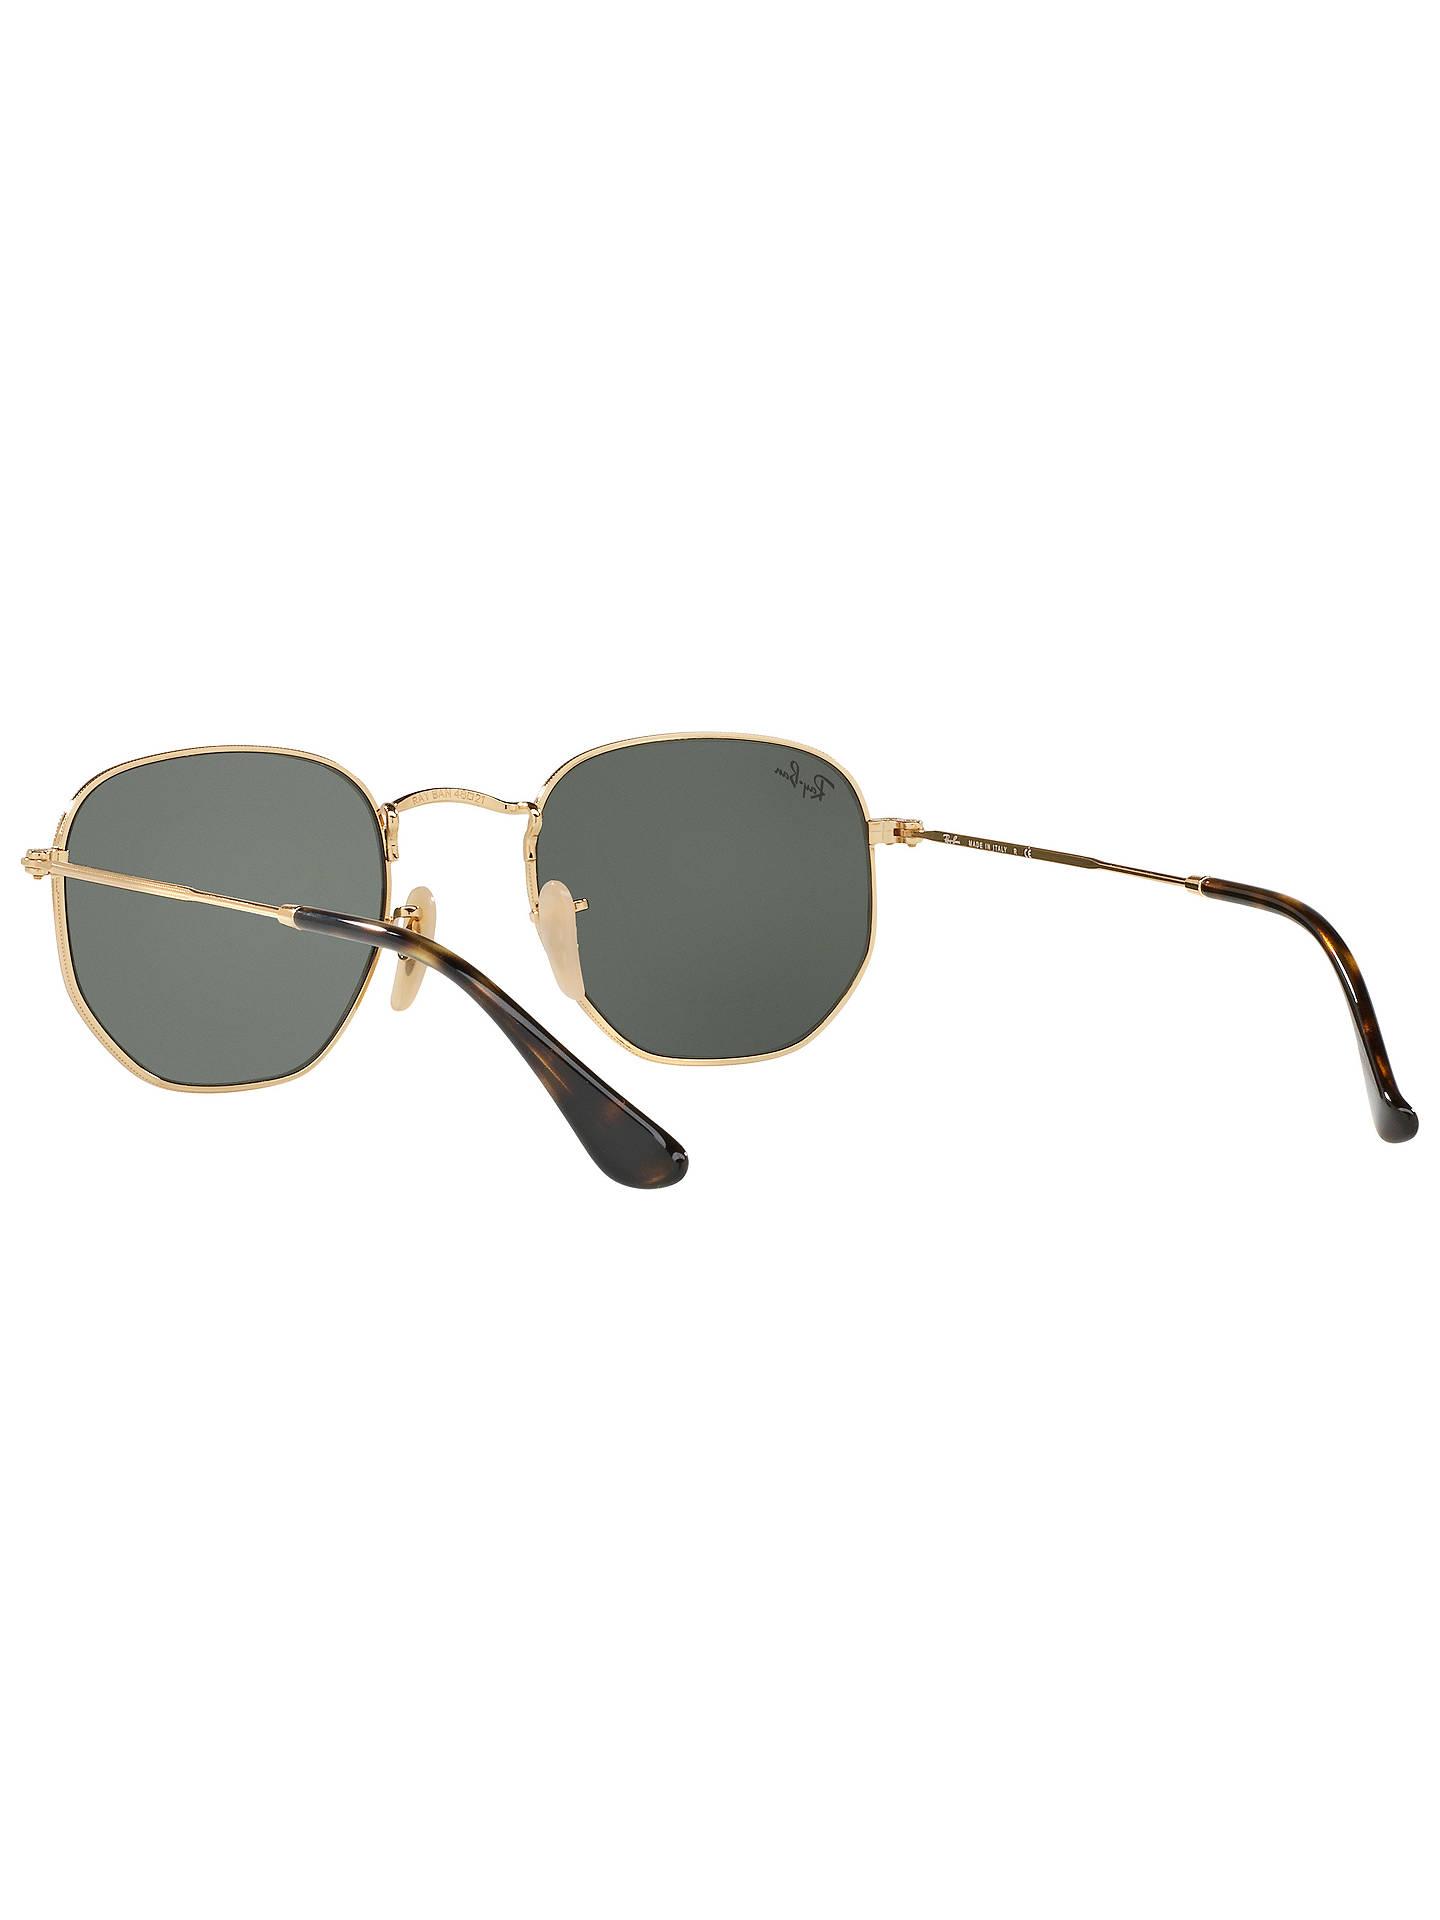 Ray Ban Rb3548 Hexagonal Flat Lens Sunglasses Gold Dark Green